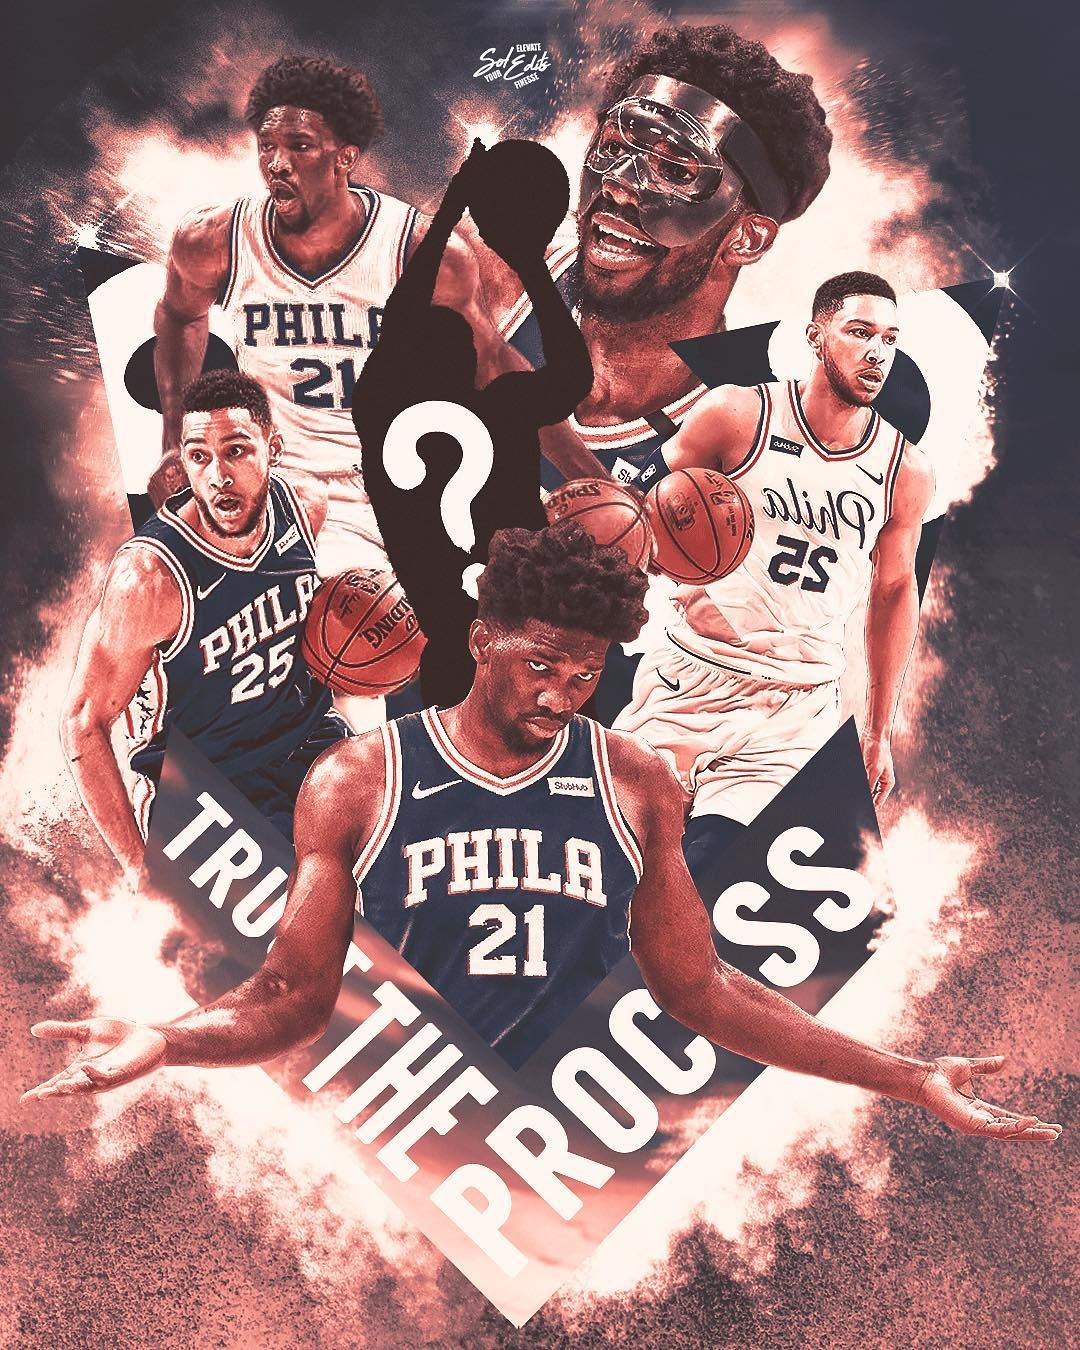 Pin By Marley Morebucks Davis On Nba Philadelphia 76ers Nba Art 76ers